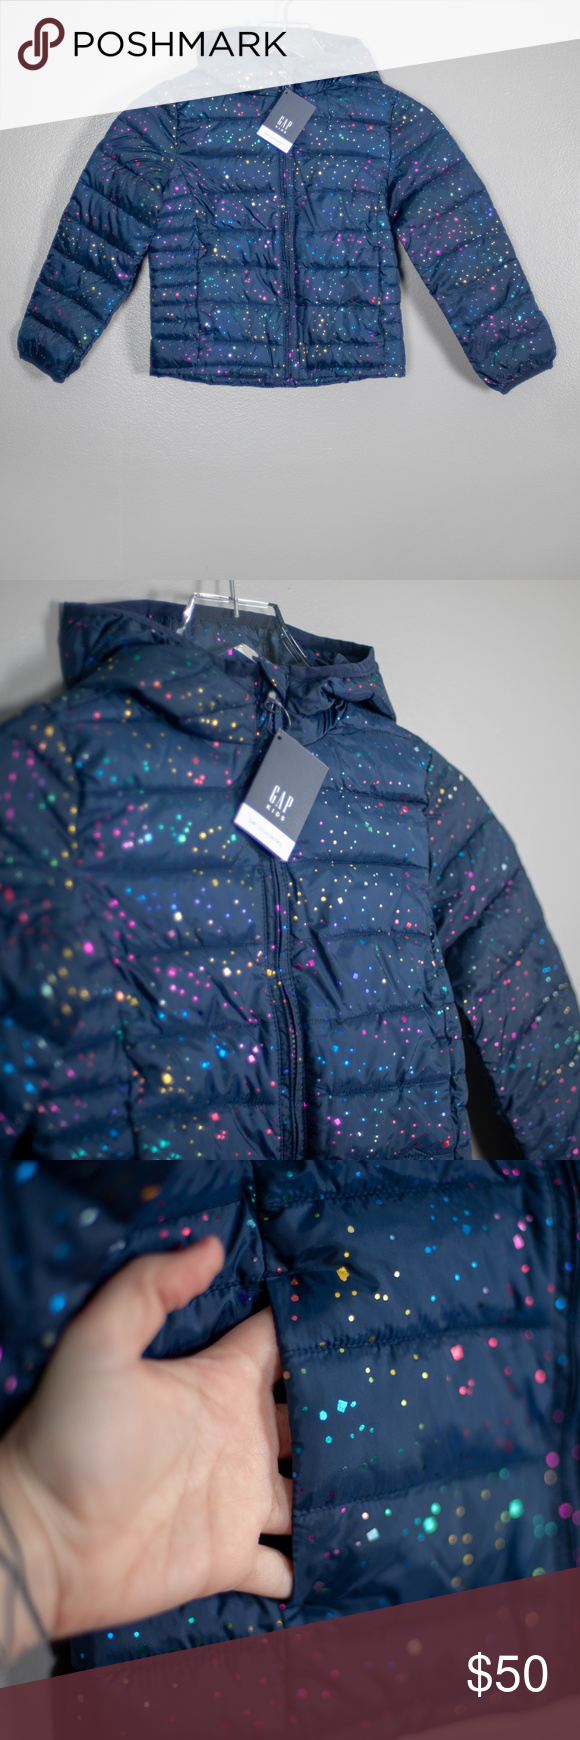 Nwt Gap Kids Coldcontrol Puffer Jacket S 6 7 Puffer Jackets Gap Kids Girls Jacket [ 1740 x 580 Pixel ]